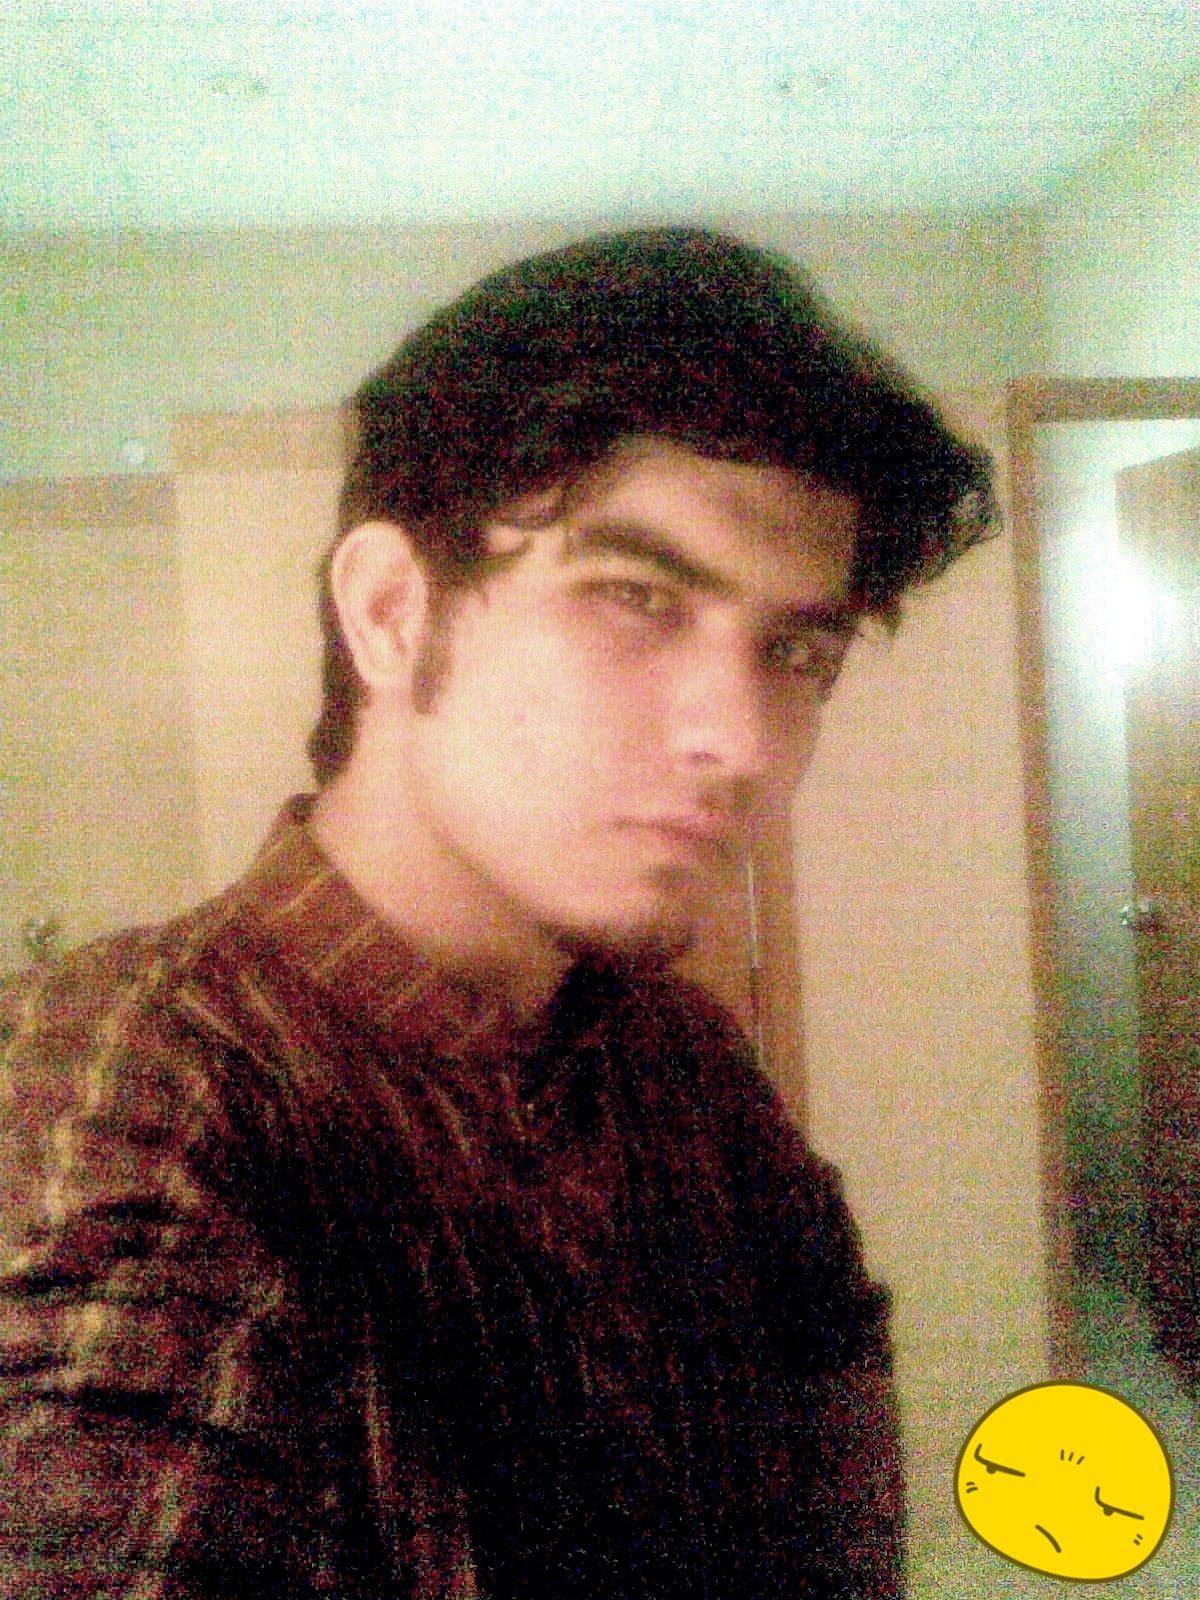 Khalid Abdul-Saboor